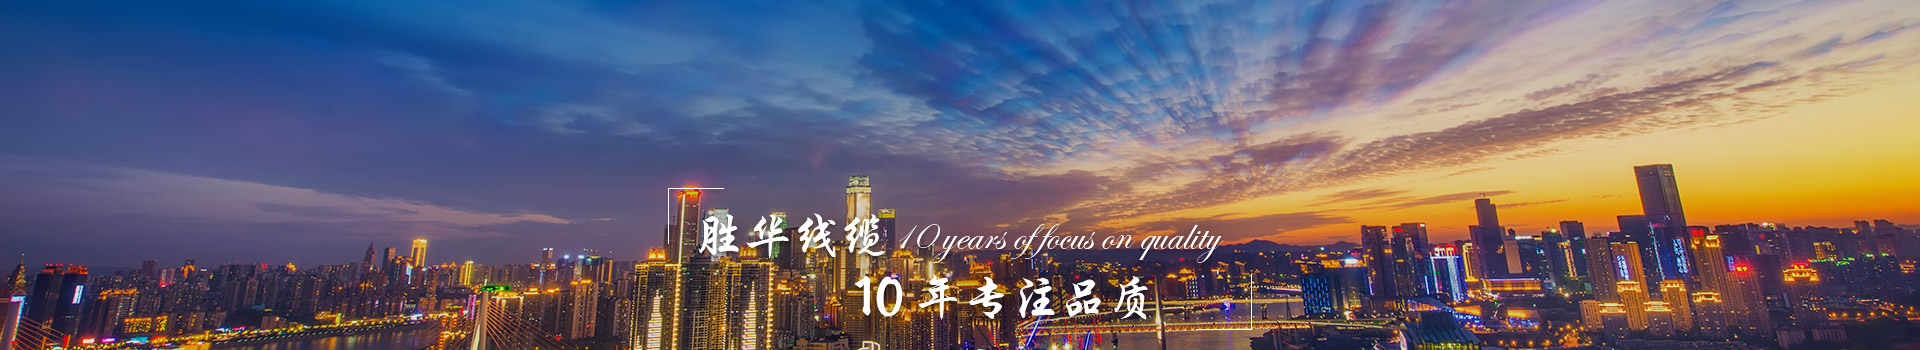 wwwyzc88官网防火ca88亚洲城下载官网